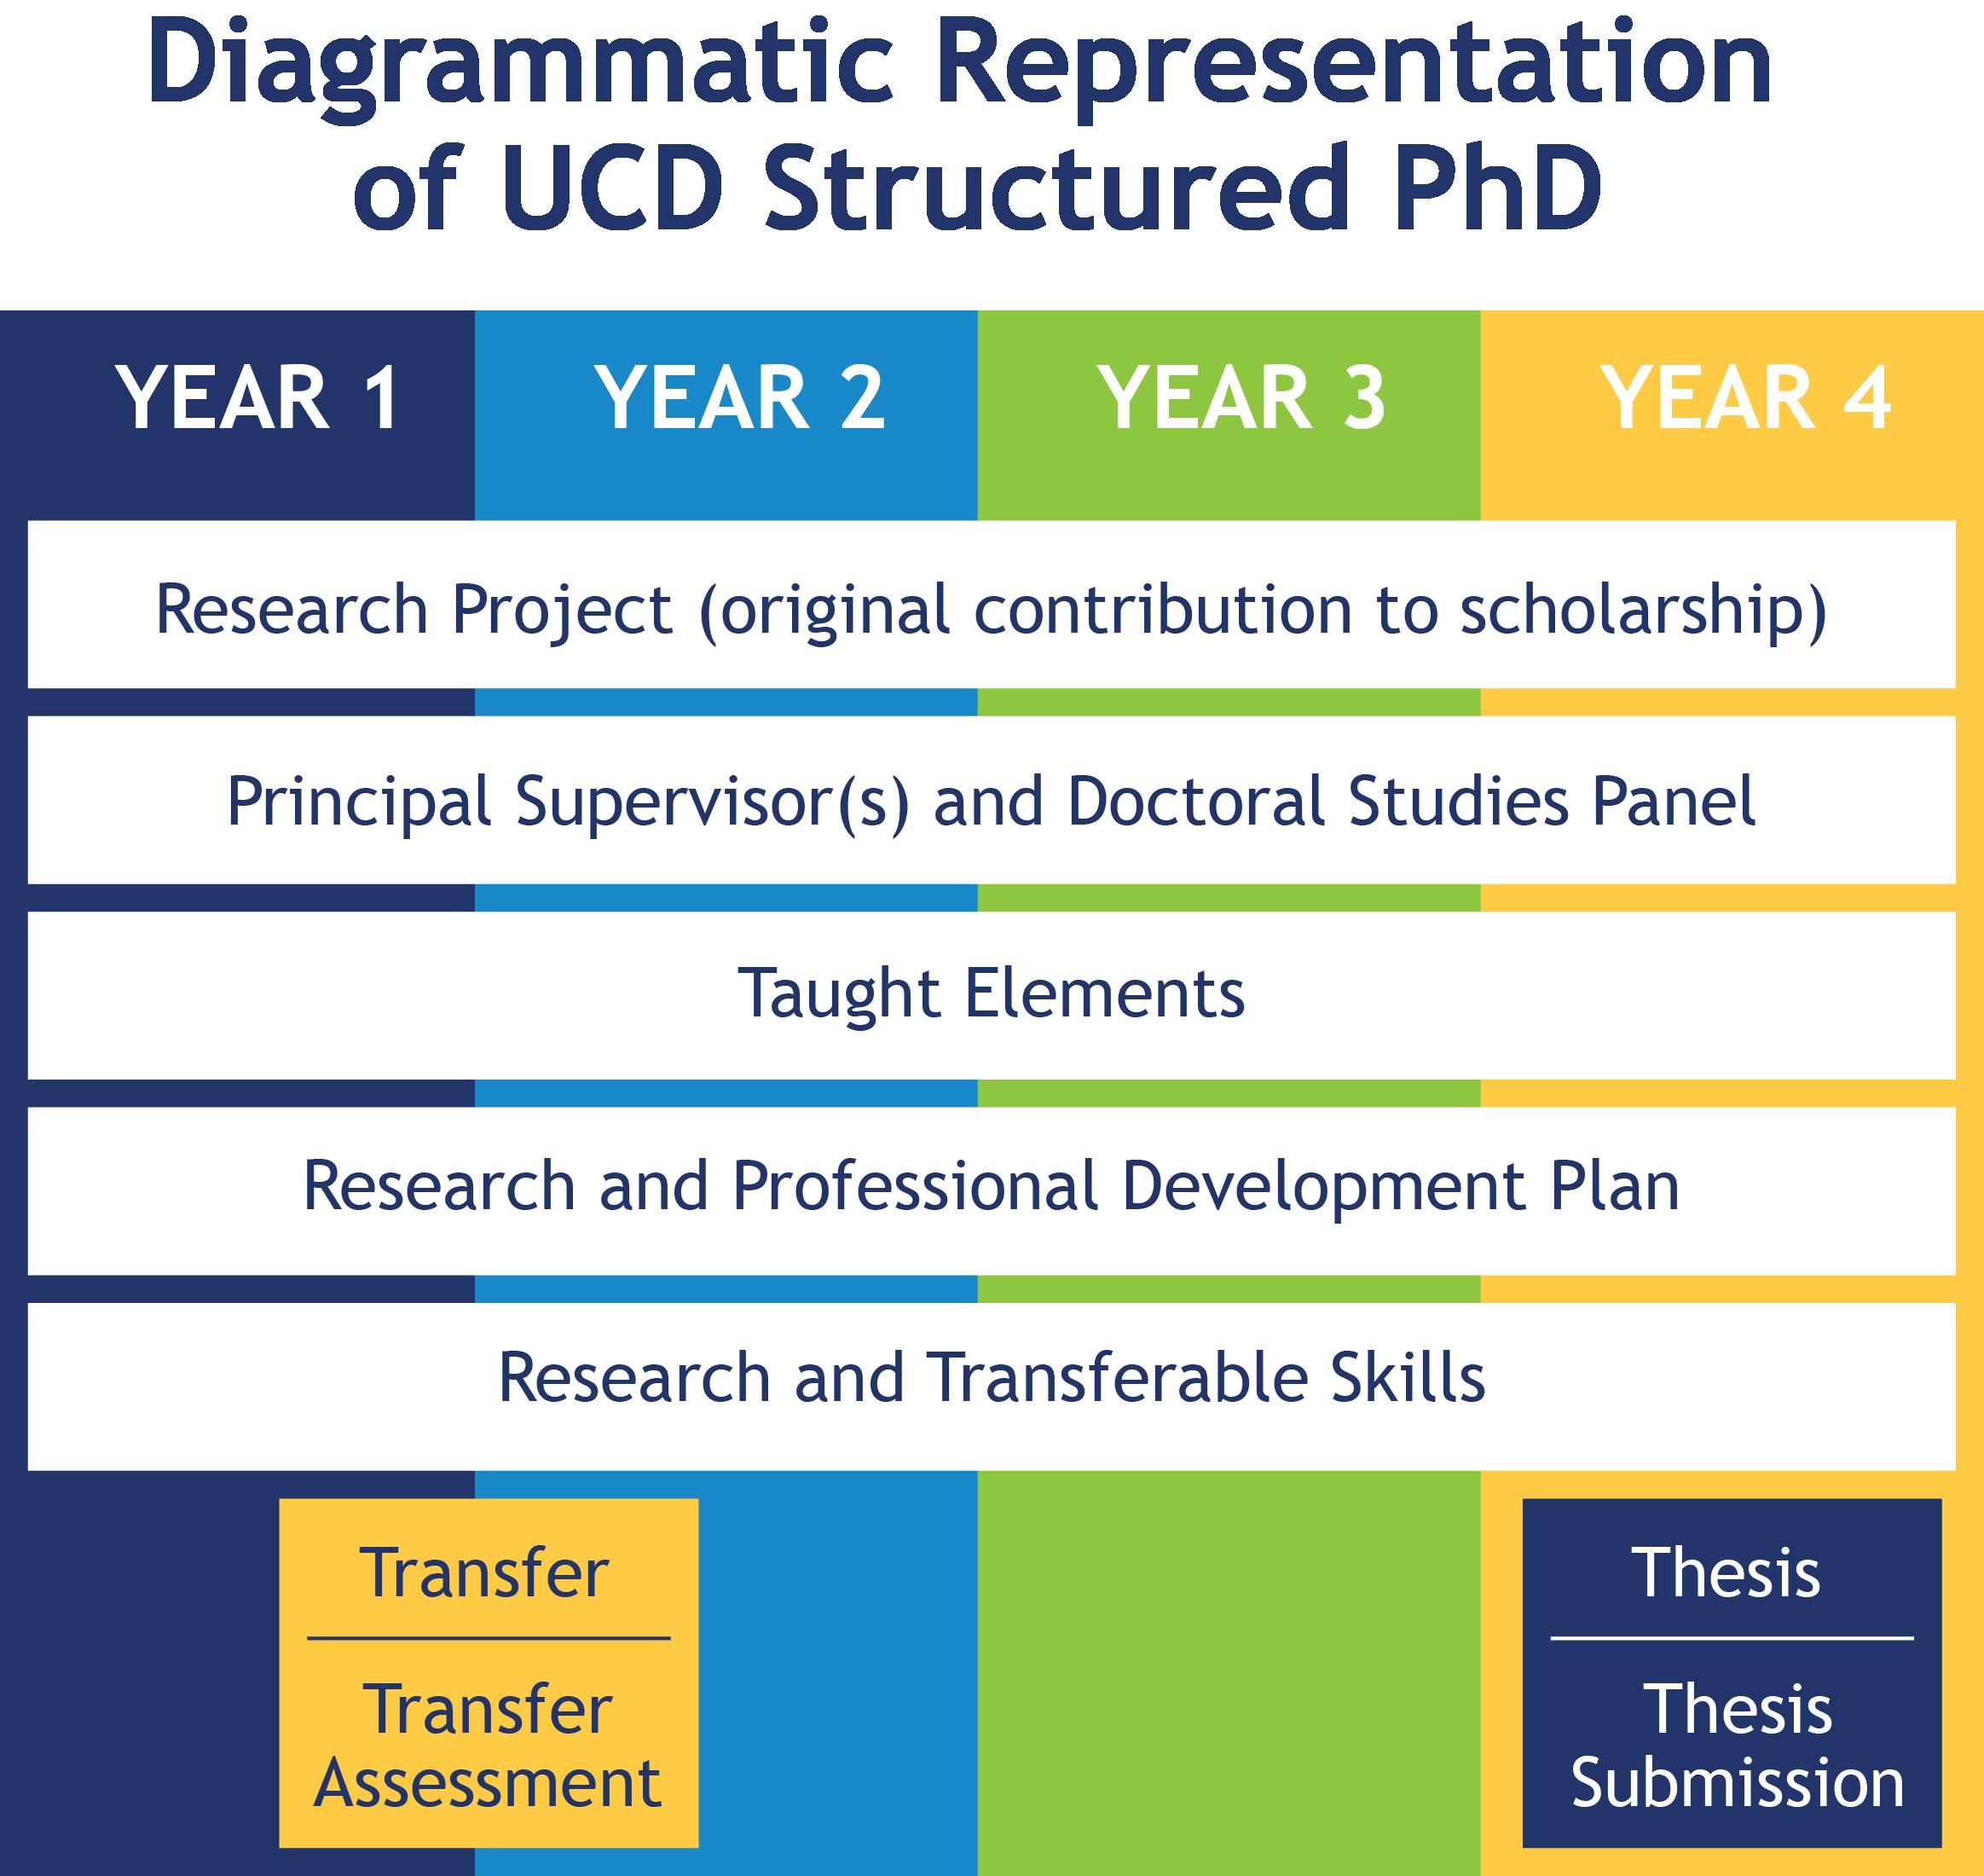 structured phd | ucd graduate studies